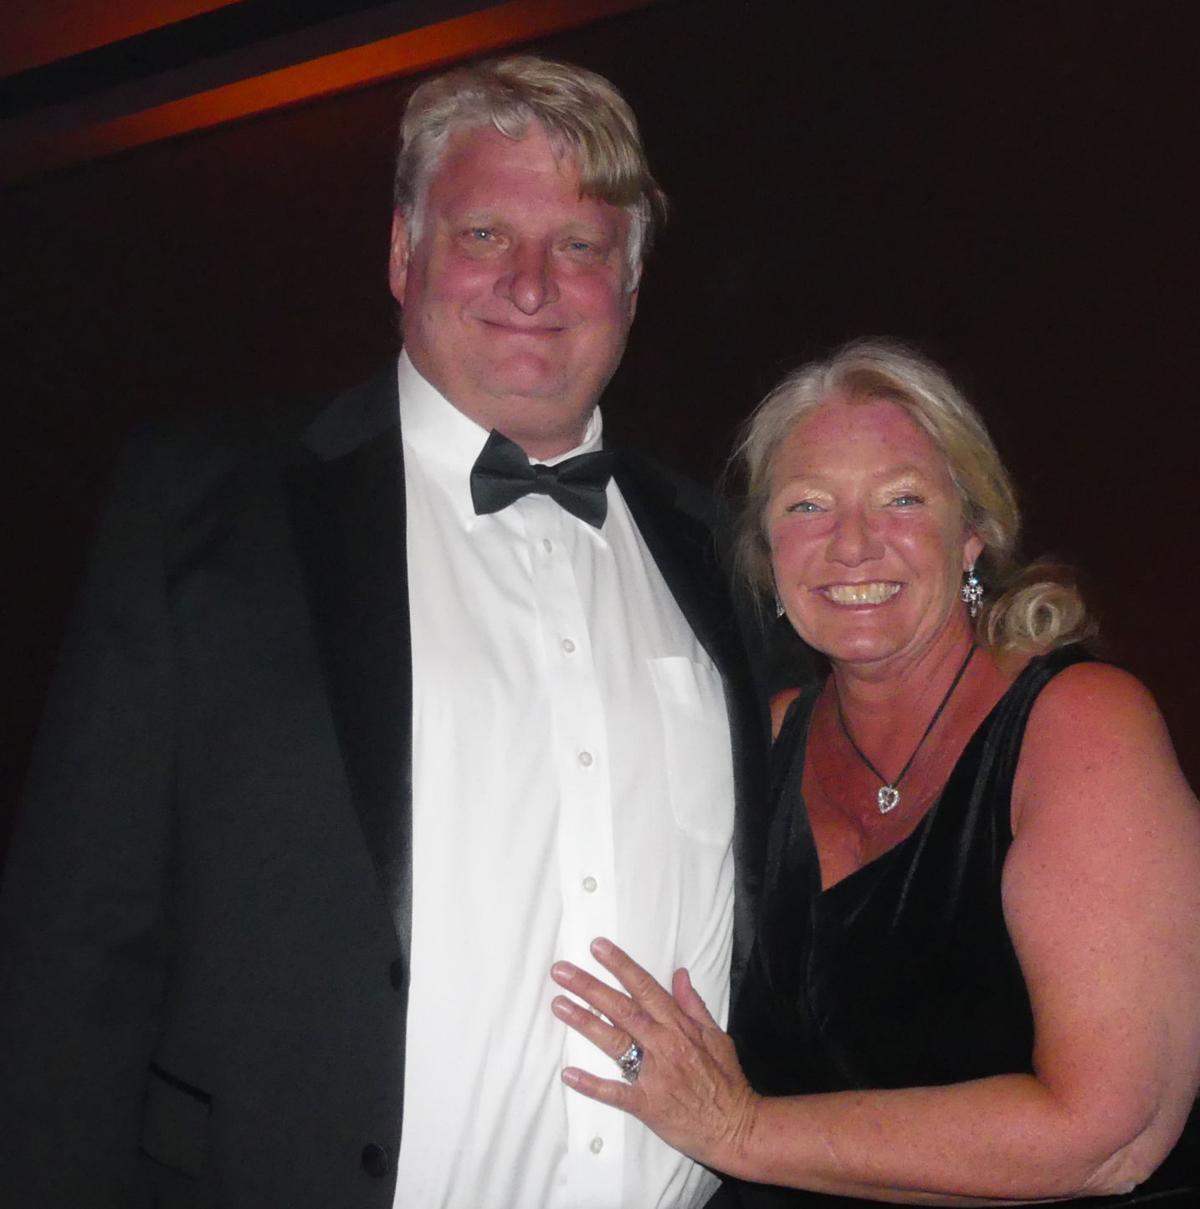 Broadmoor 100th Anniversary Gala: Gazette Editor Vince Bzdek and wife, Kelsey. 060218 Photo by Linda Navarro